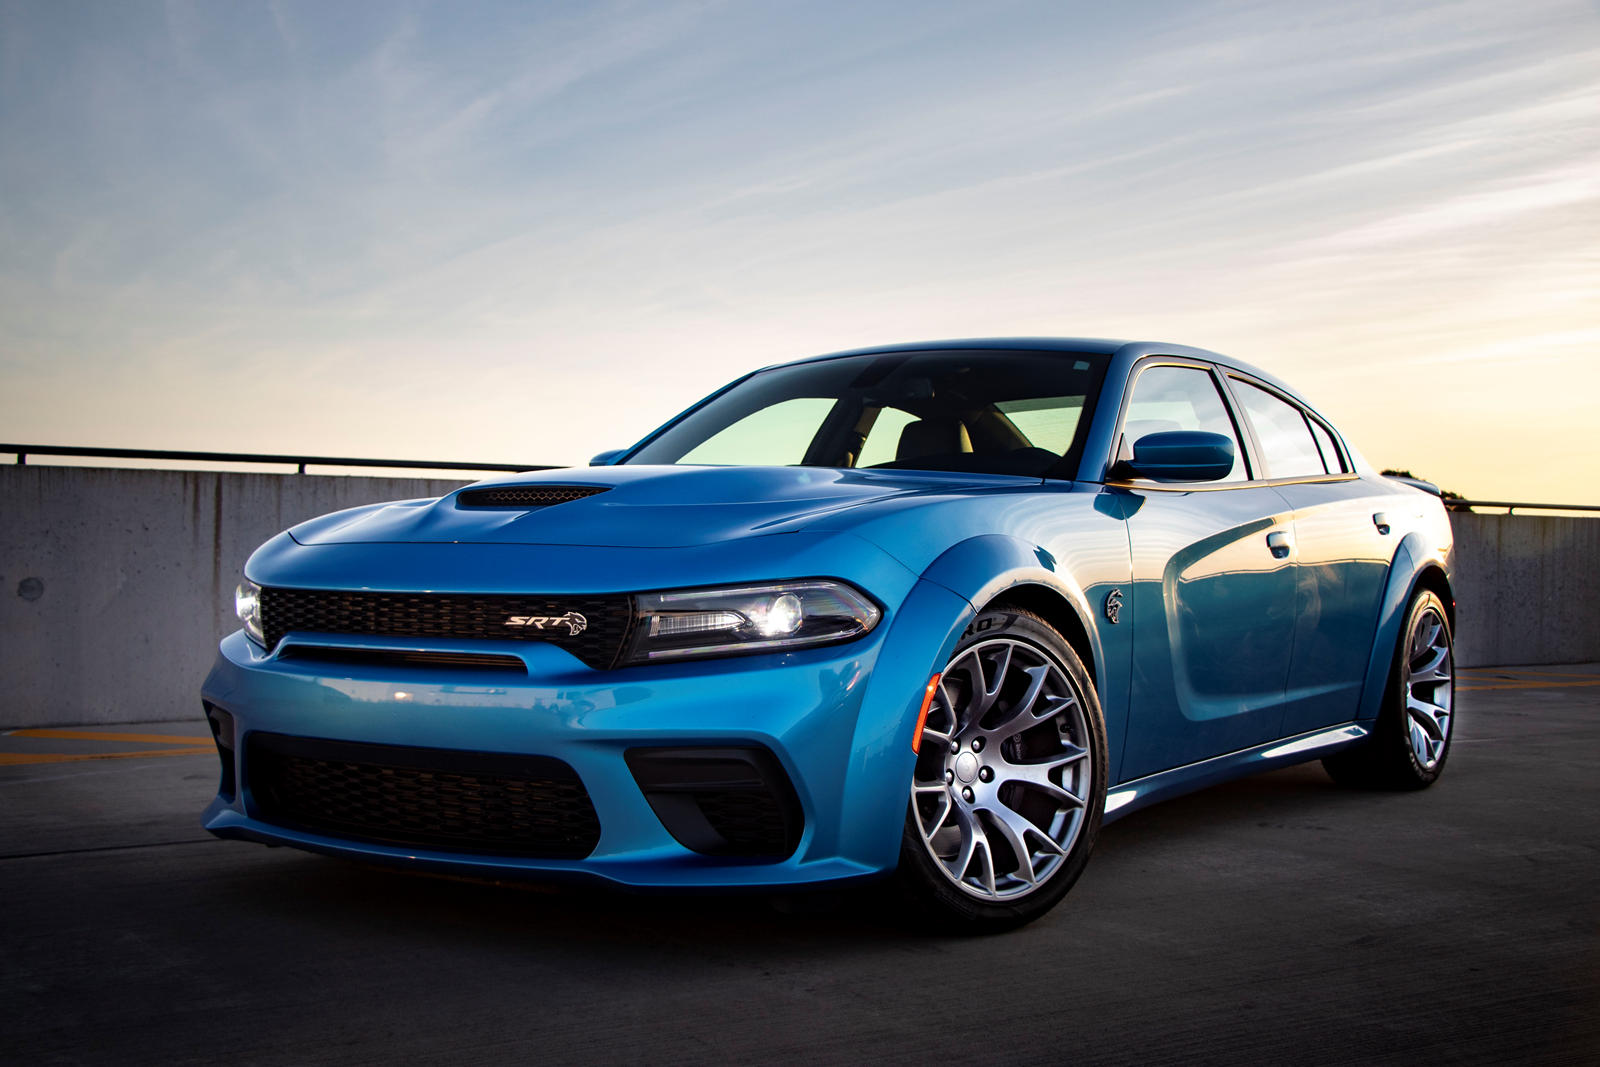 2020 dodge charger srt hellcat trims & specs   carbuzz